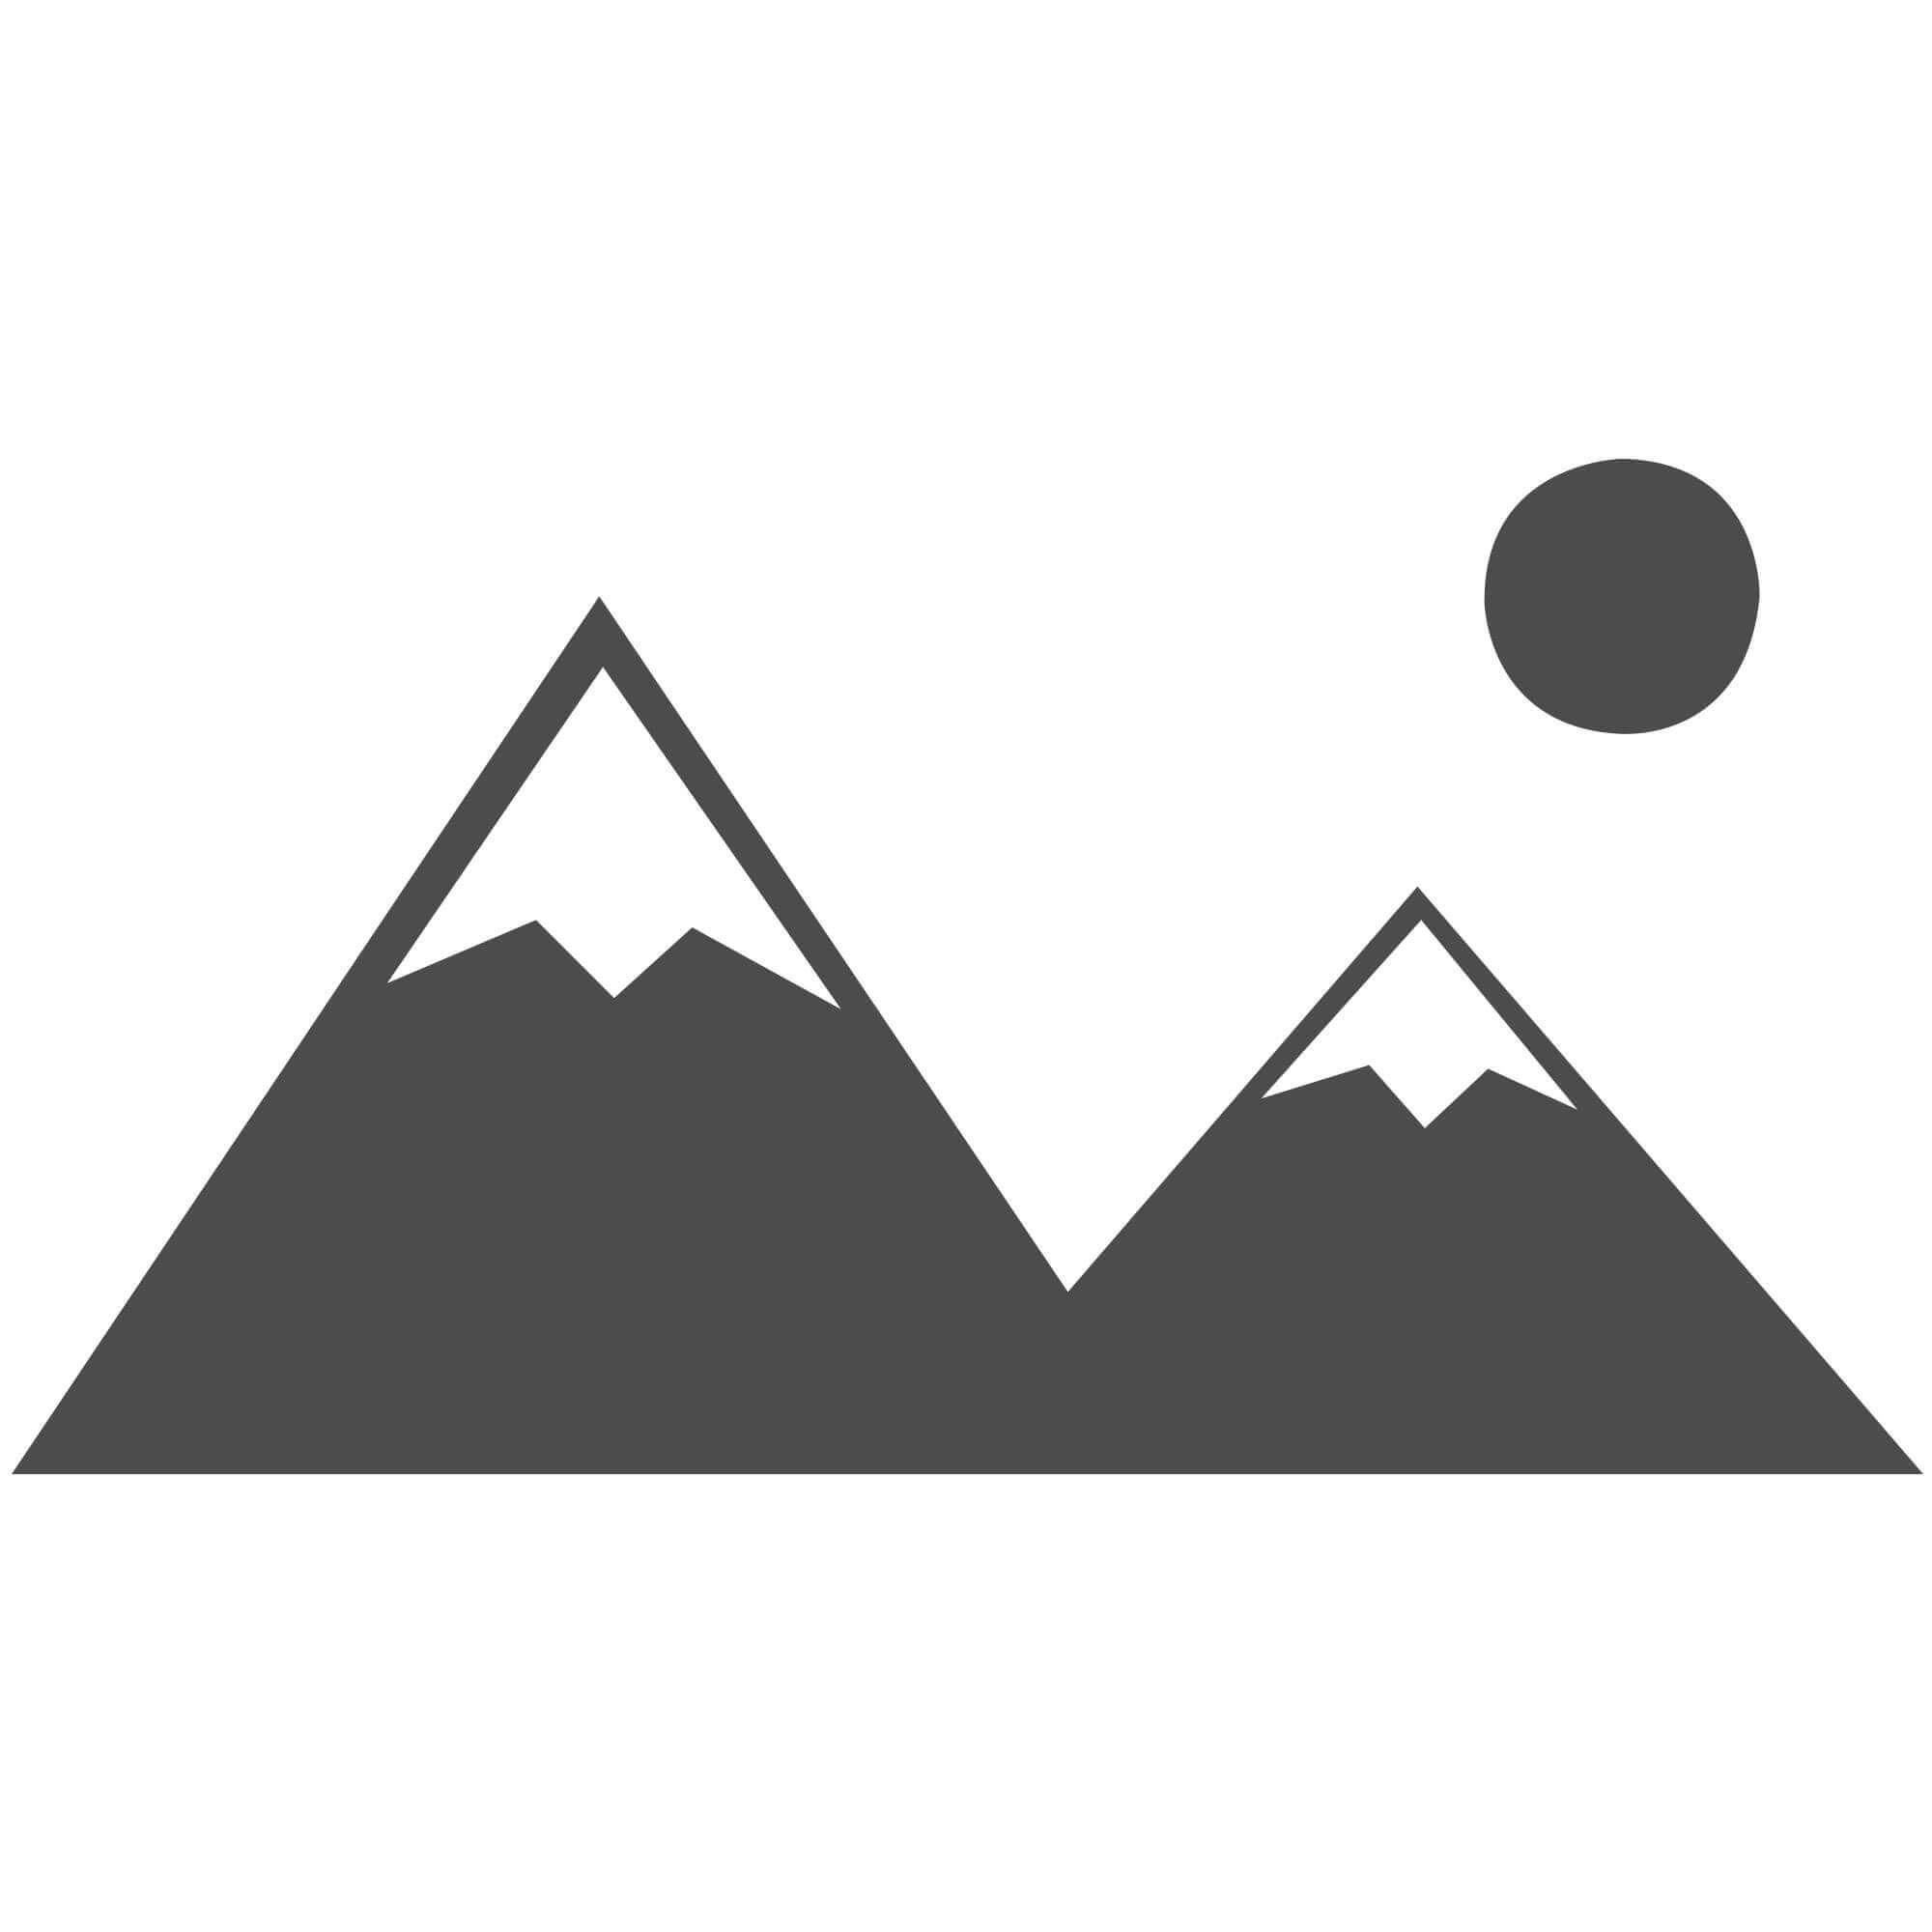 "Galleria Rug - Stripe Multi 79164 4848 - Size 240 x 330 cm (7'10"" x 10'10"")"